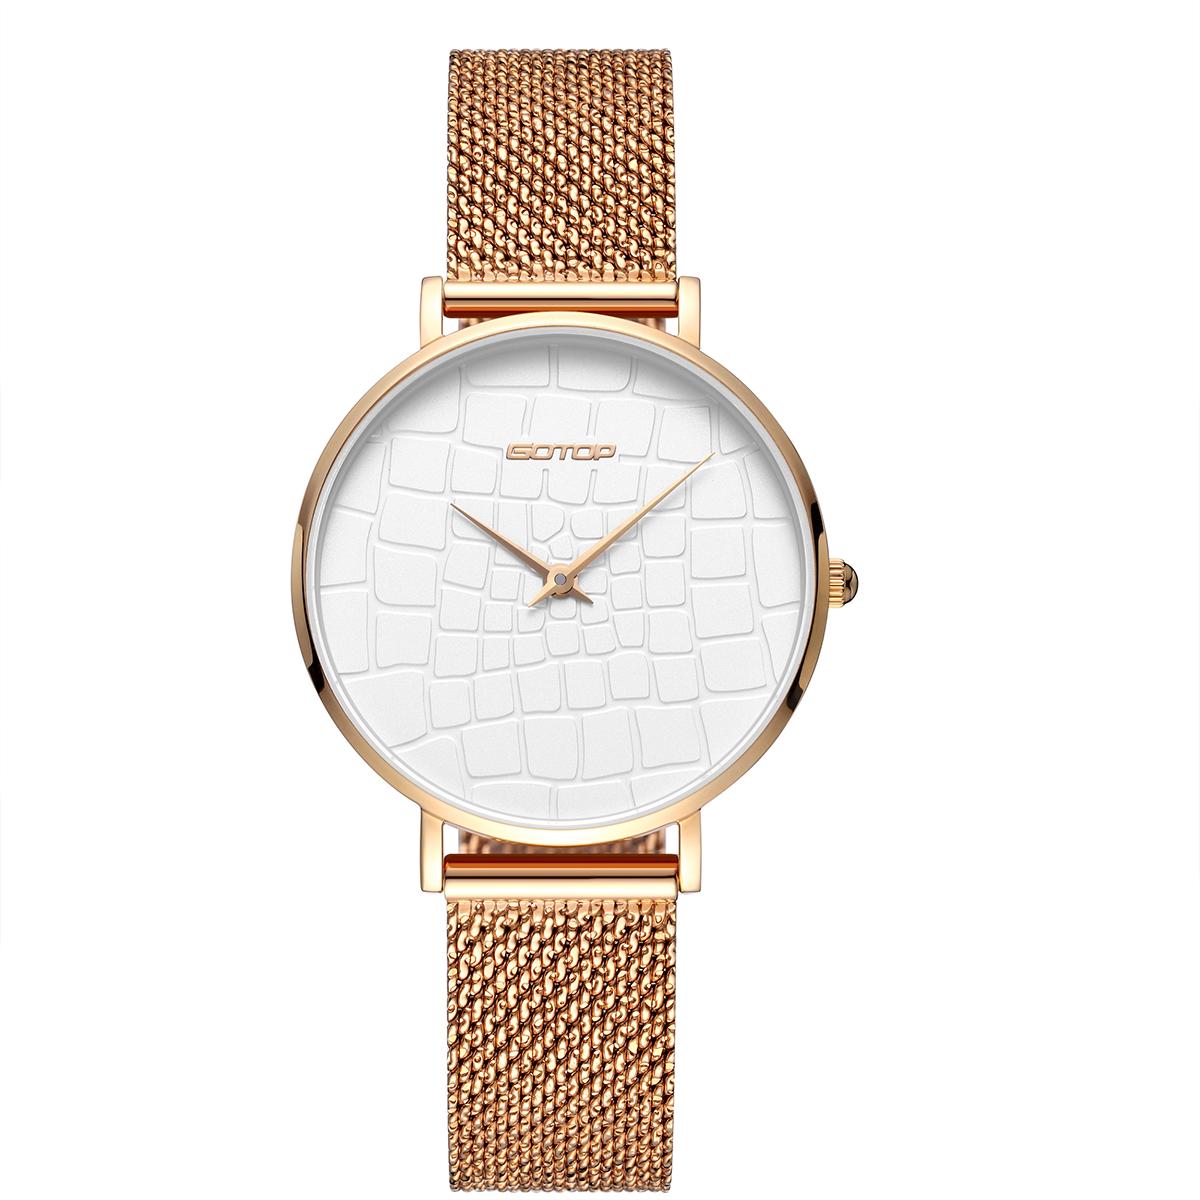 SS550 Slim Case Mesh Strap Women's Watch